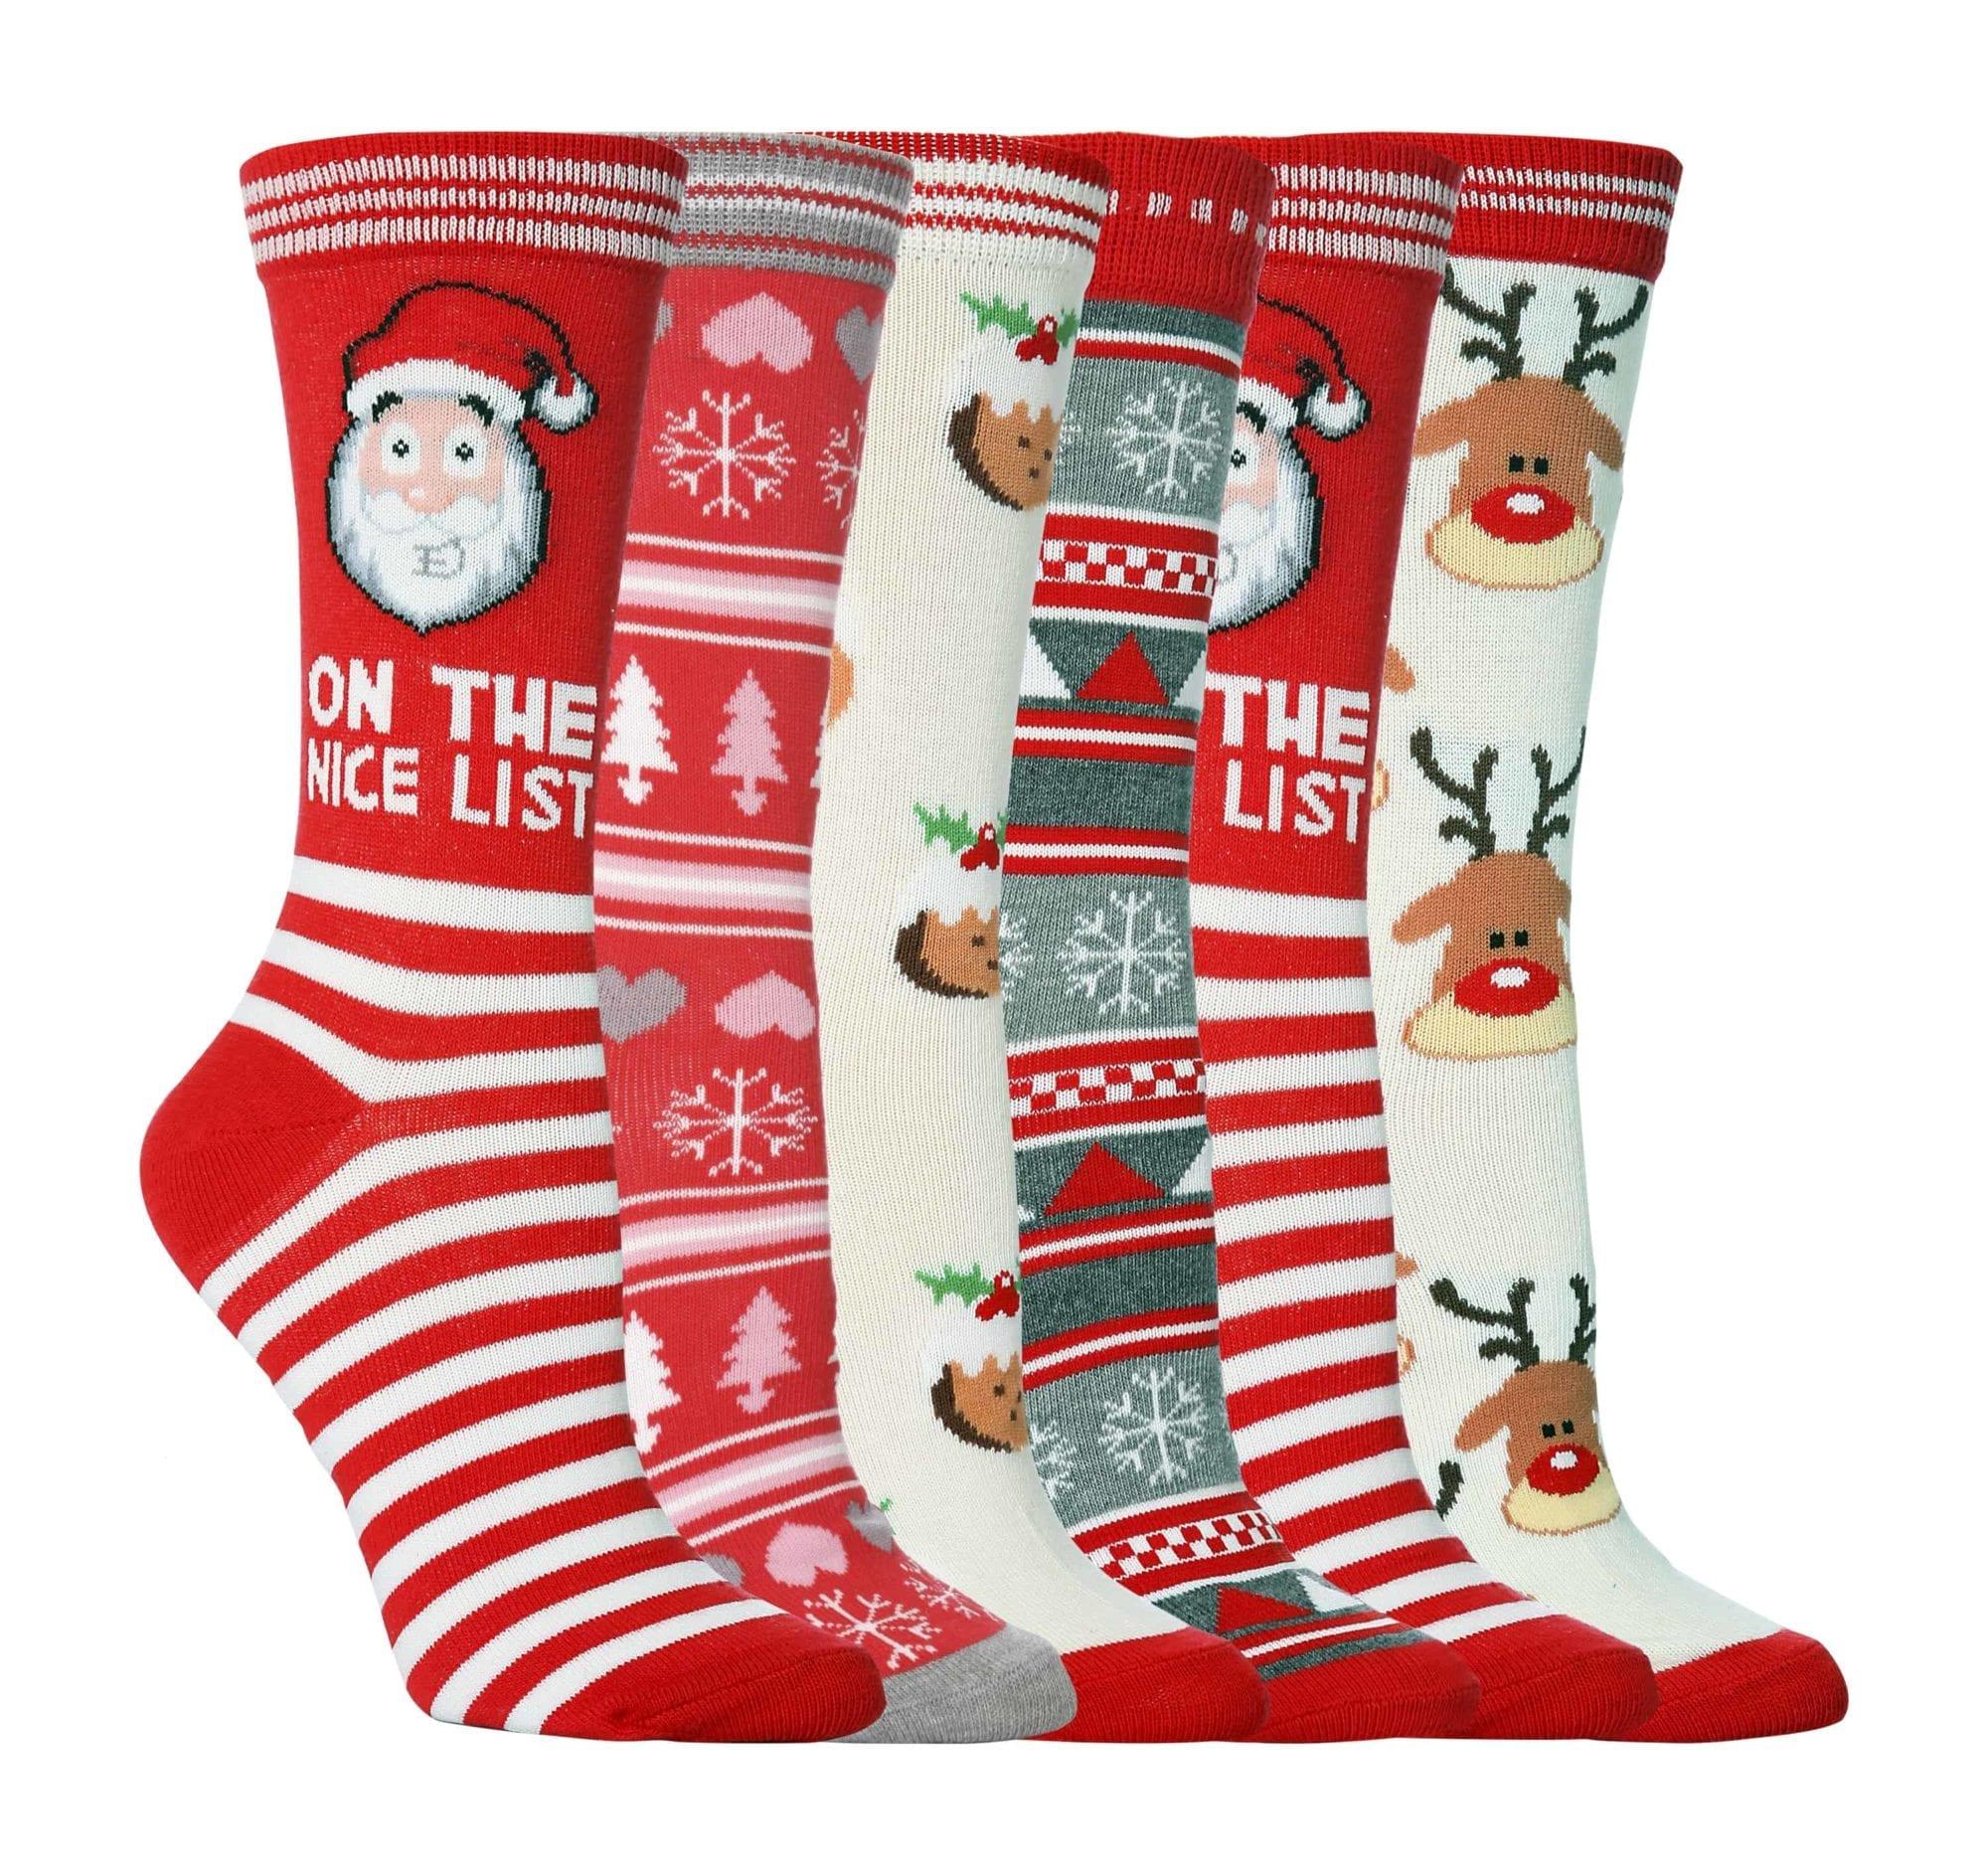 LADIES COTTON RICH CHRISTMAS DESIGN SOCKS GIRLS XMAS FUN GIFT NOVELTY SOCKS